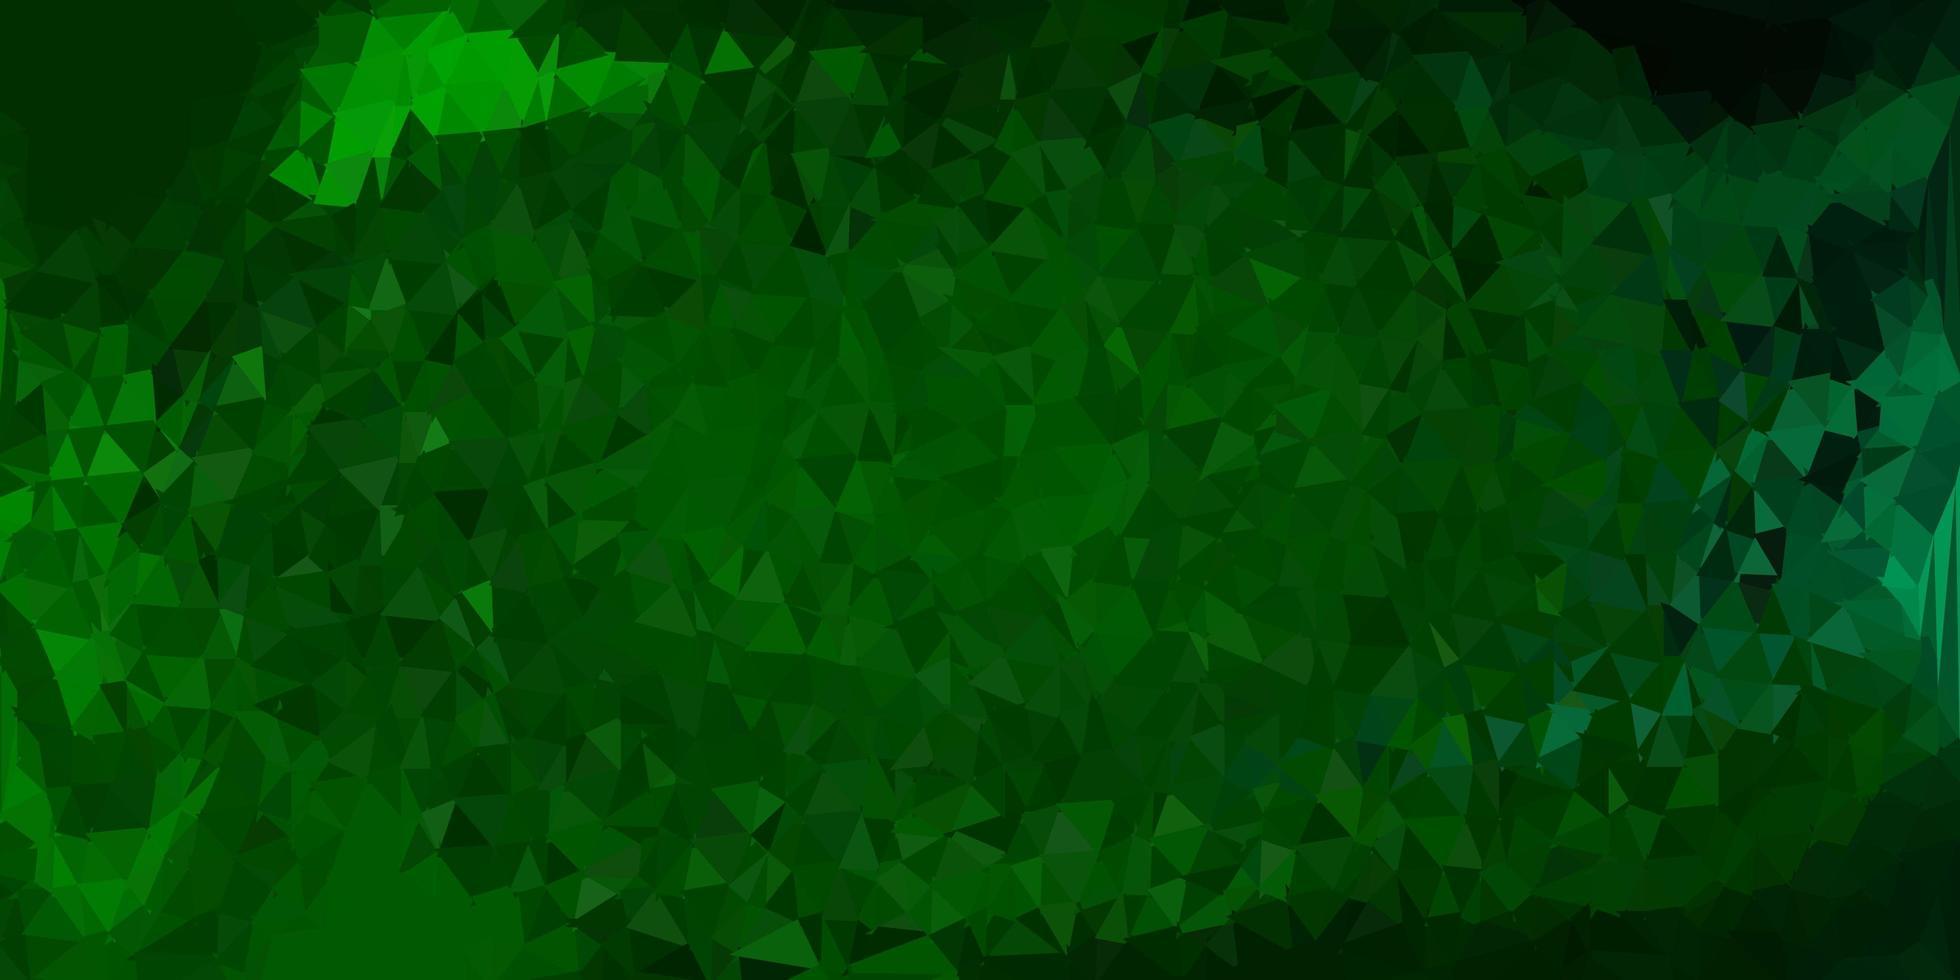 dunkelgrüne Vektor-Gradienten-Polygon-Textur. vektor